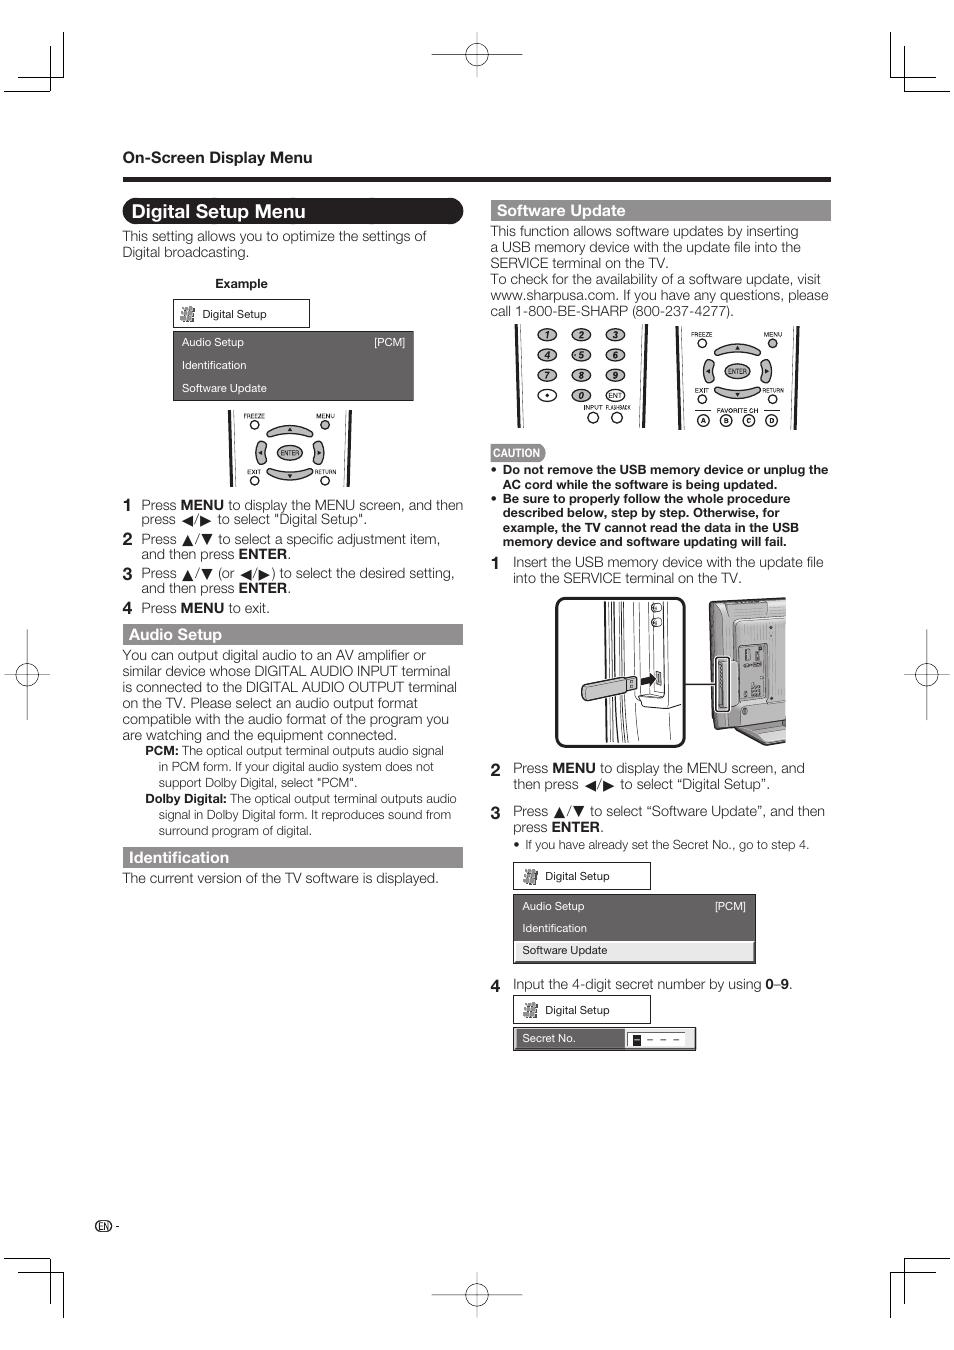 digital setup menu audio setup identification sharp aquos lc rh manualsdir com User Manual Sharp Fax Machines Sharp ManualsOnline